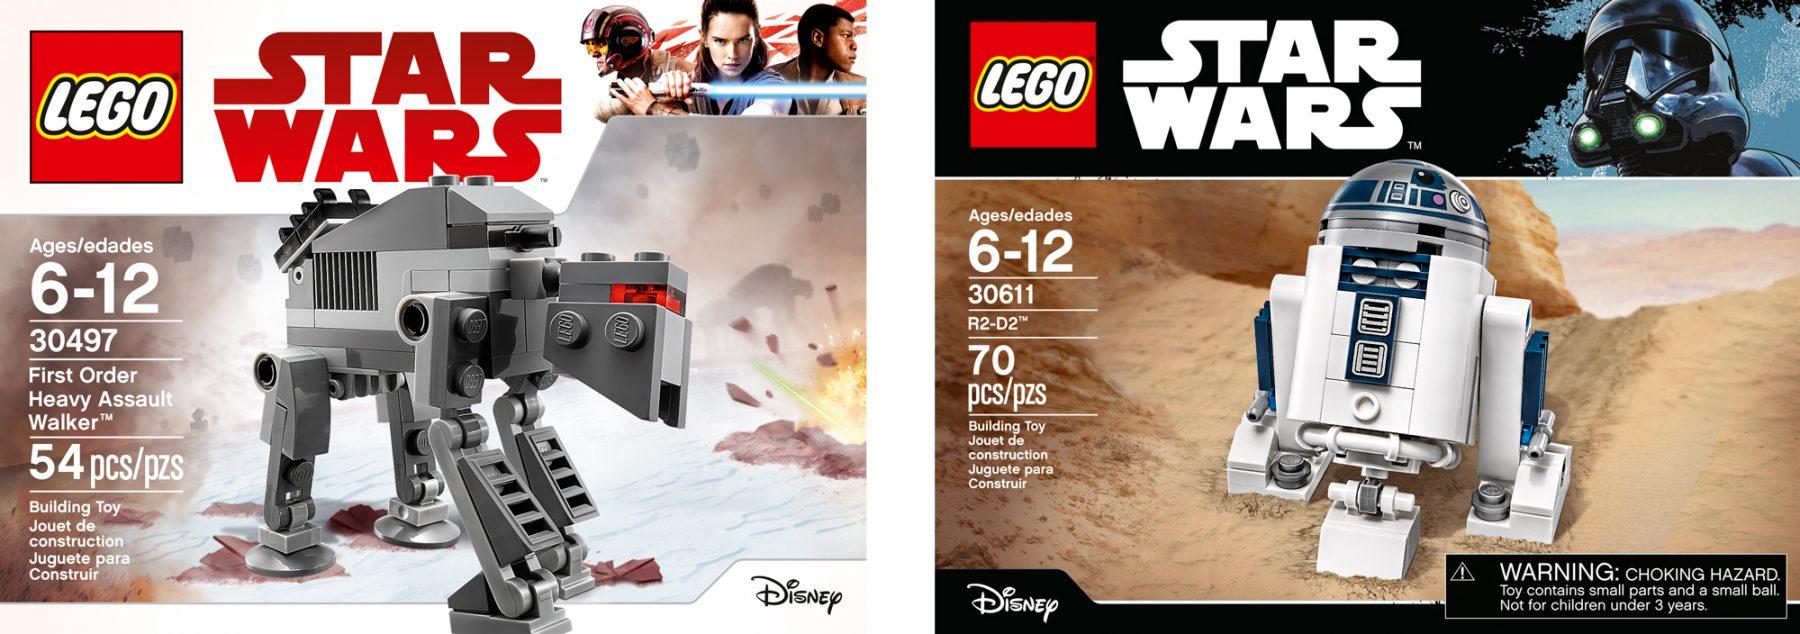 LEGO Star Wars Packaging — Design: MS, Bernie Cavendar / Photo: Atwater